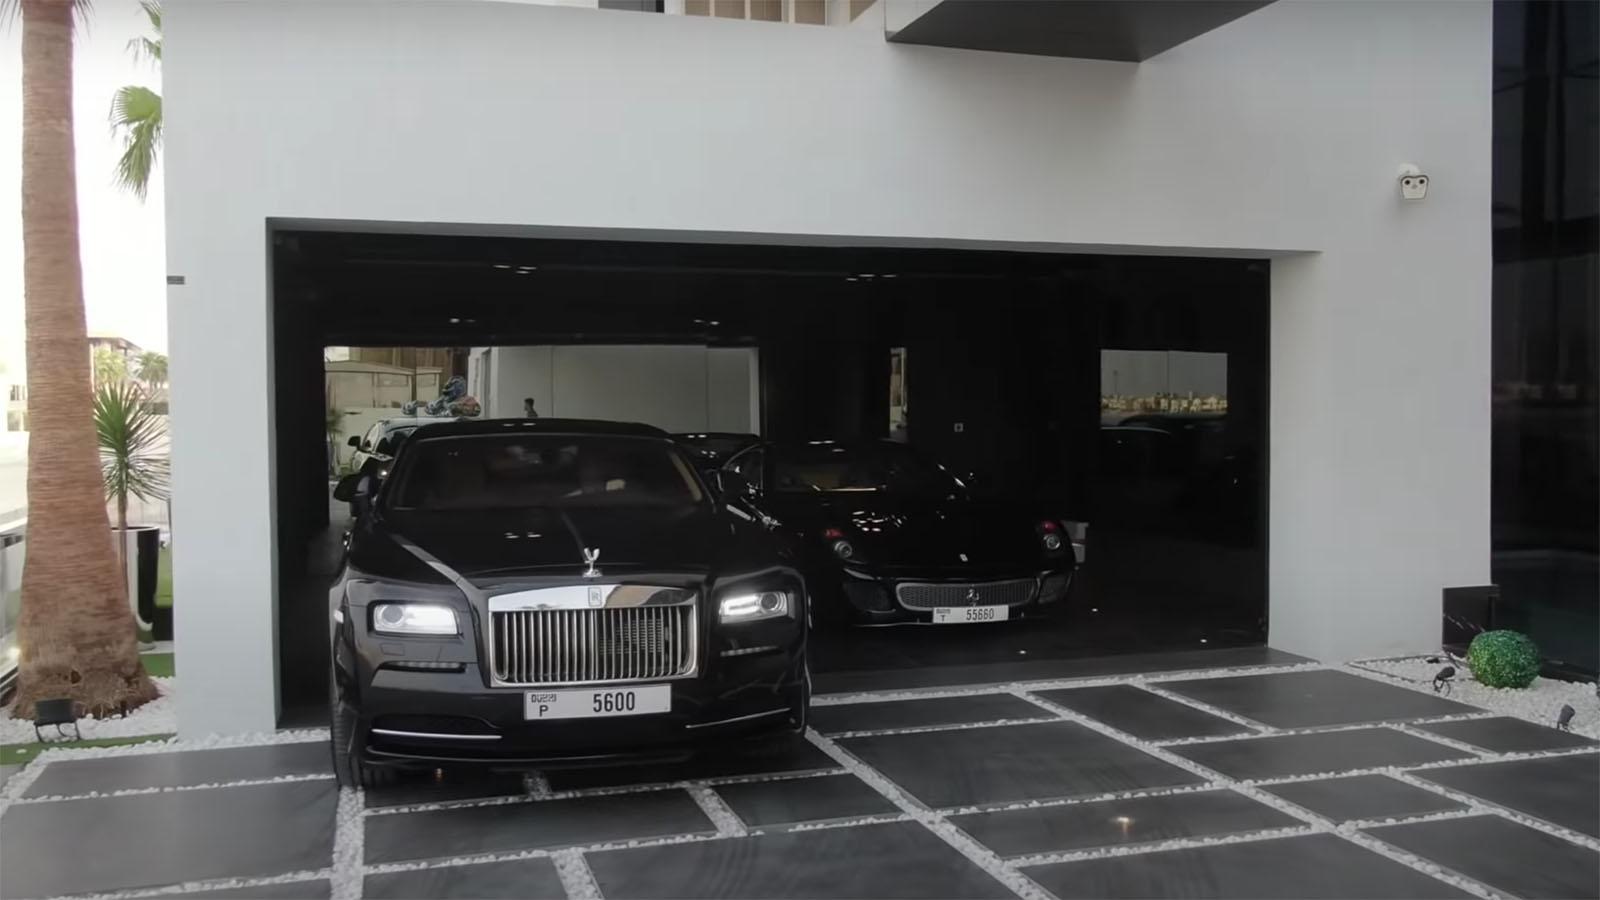 Rolls Royce and Ferrari in mansion garage